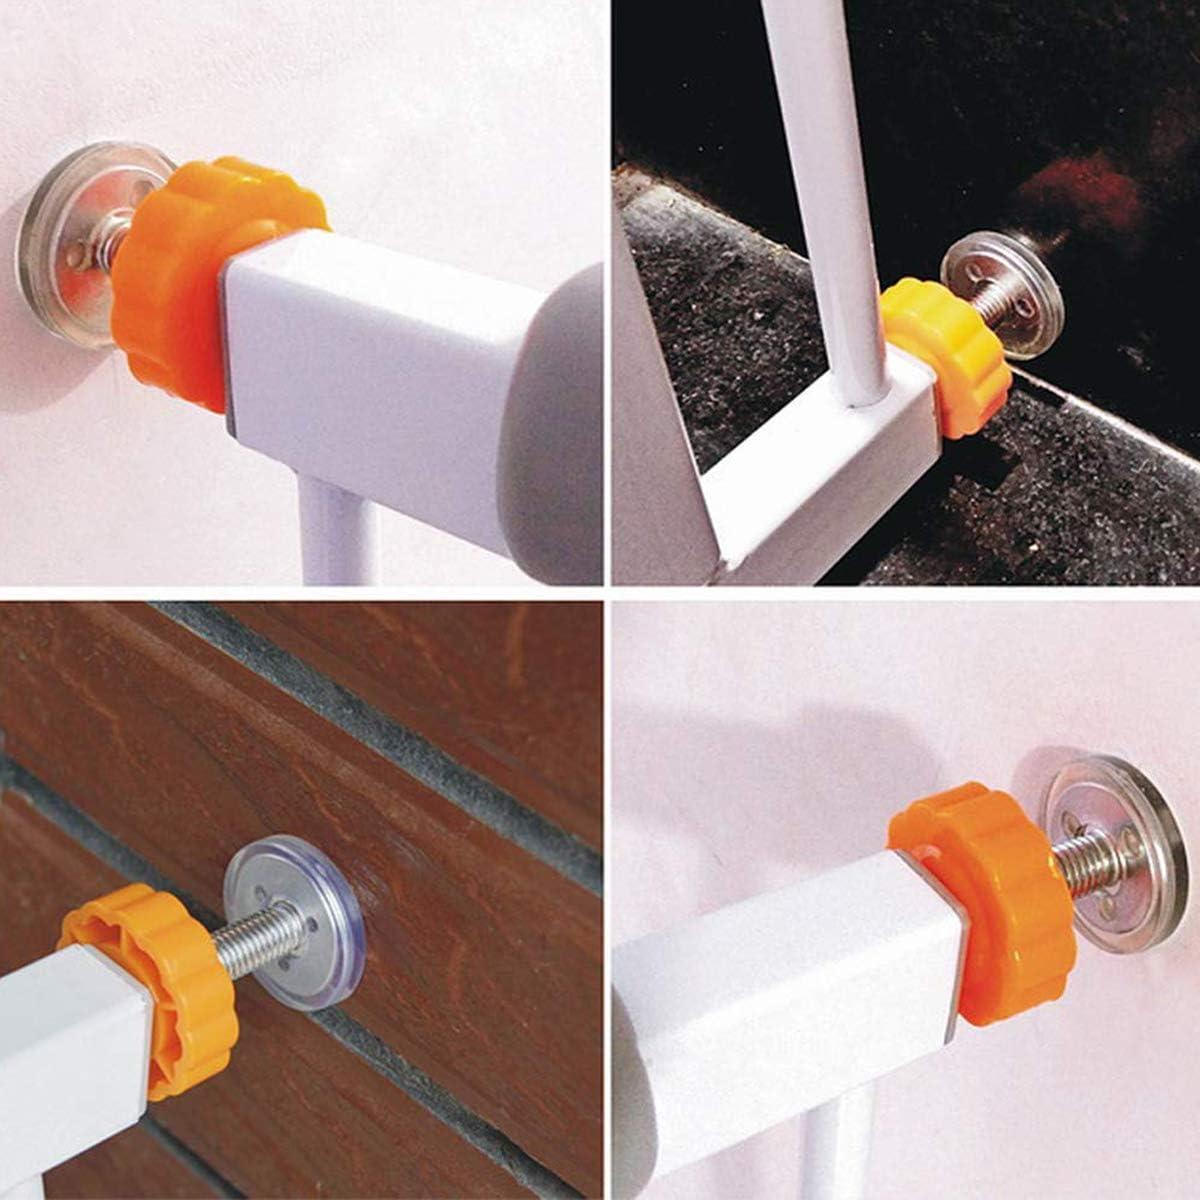 ZUZER 8pcs Pressure Baby Gates Threaded Spindle Rods M10 Walk Thru Gates Accessory Screw Bolts Safety Gate Screws for Baby and Pet Safety Gates